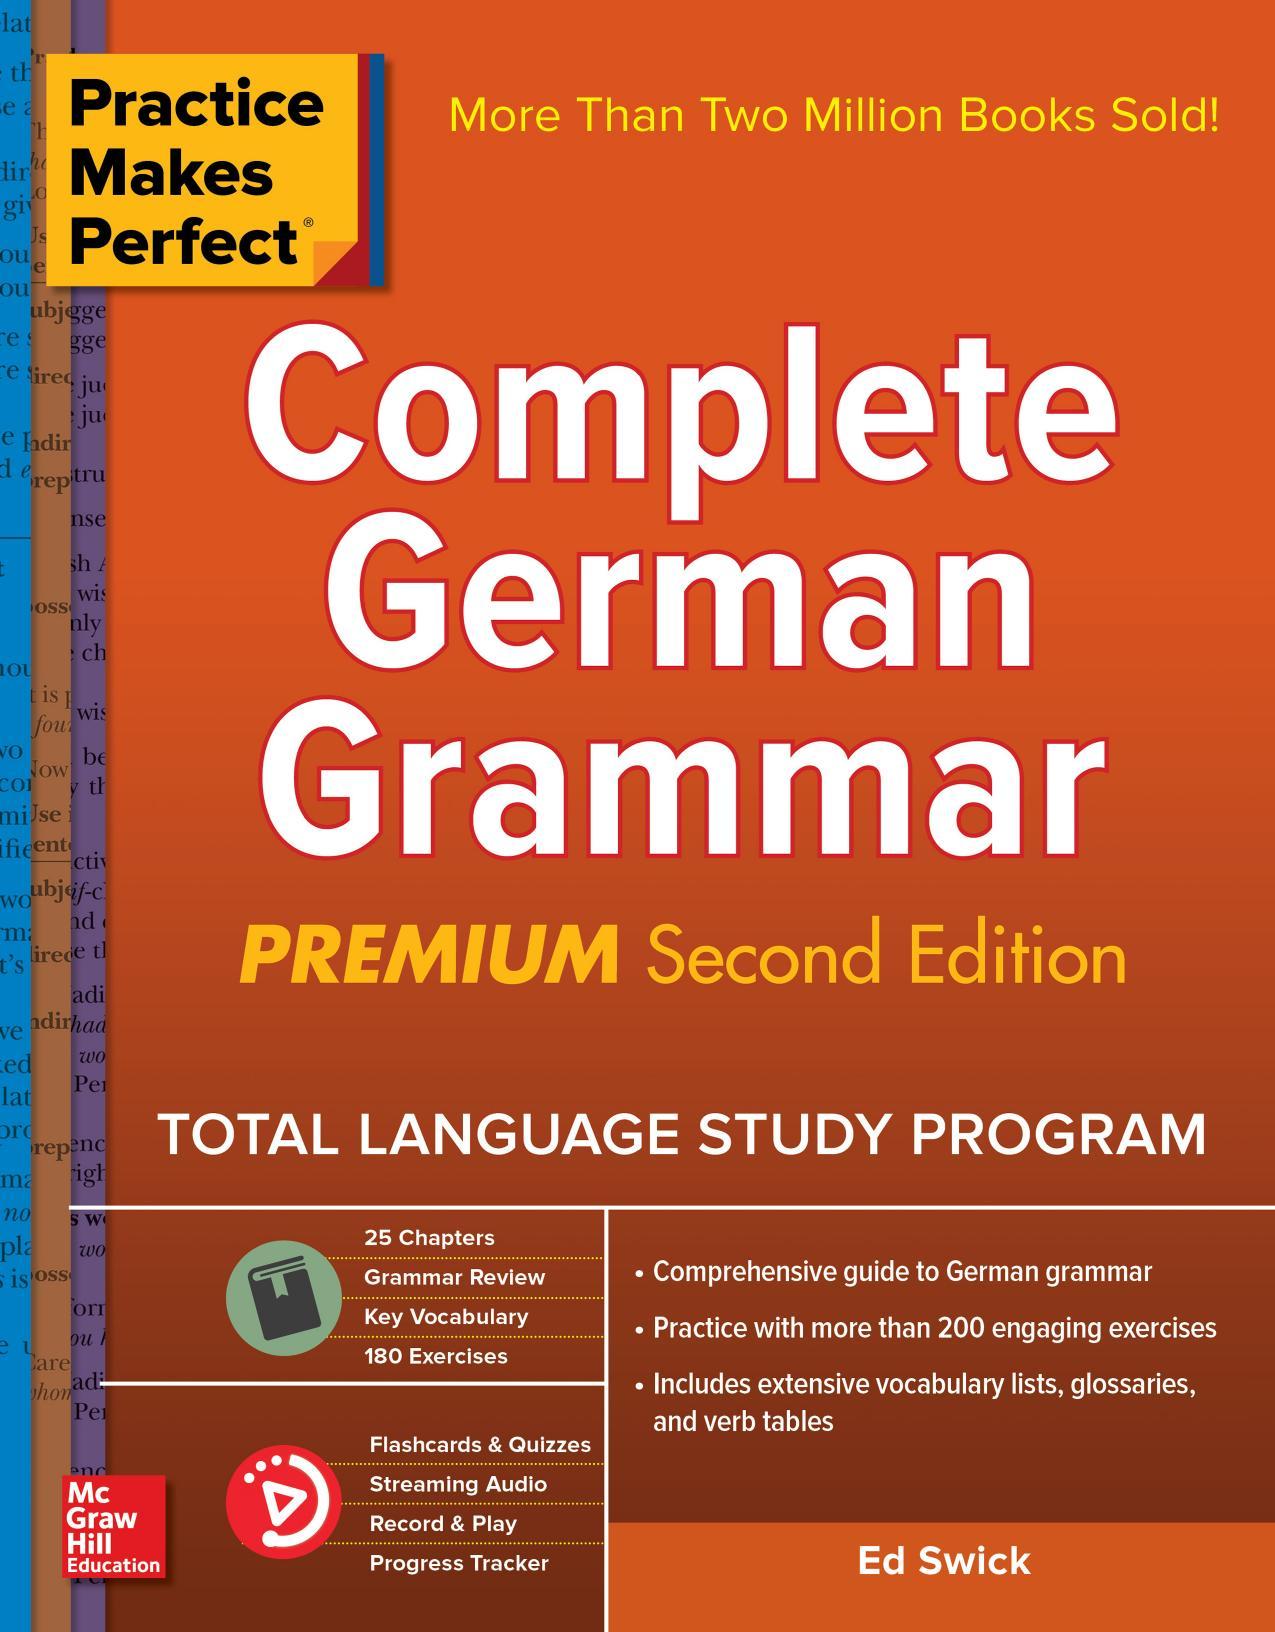 Practice Makes Perfect: Complete German Grammar, Premium 2nd Edition